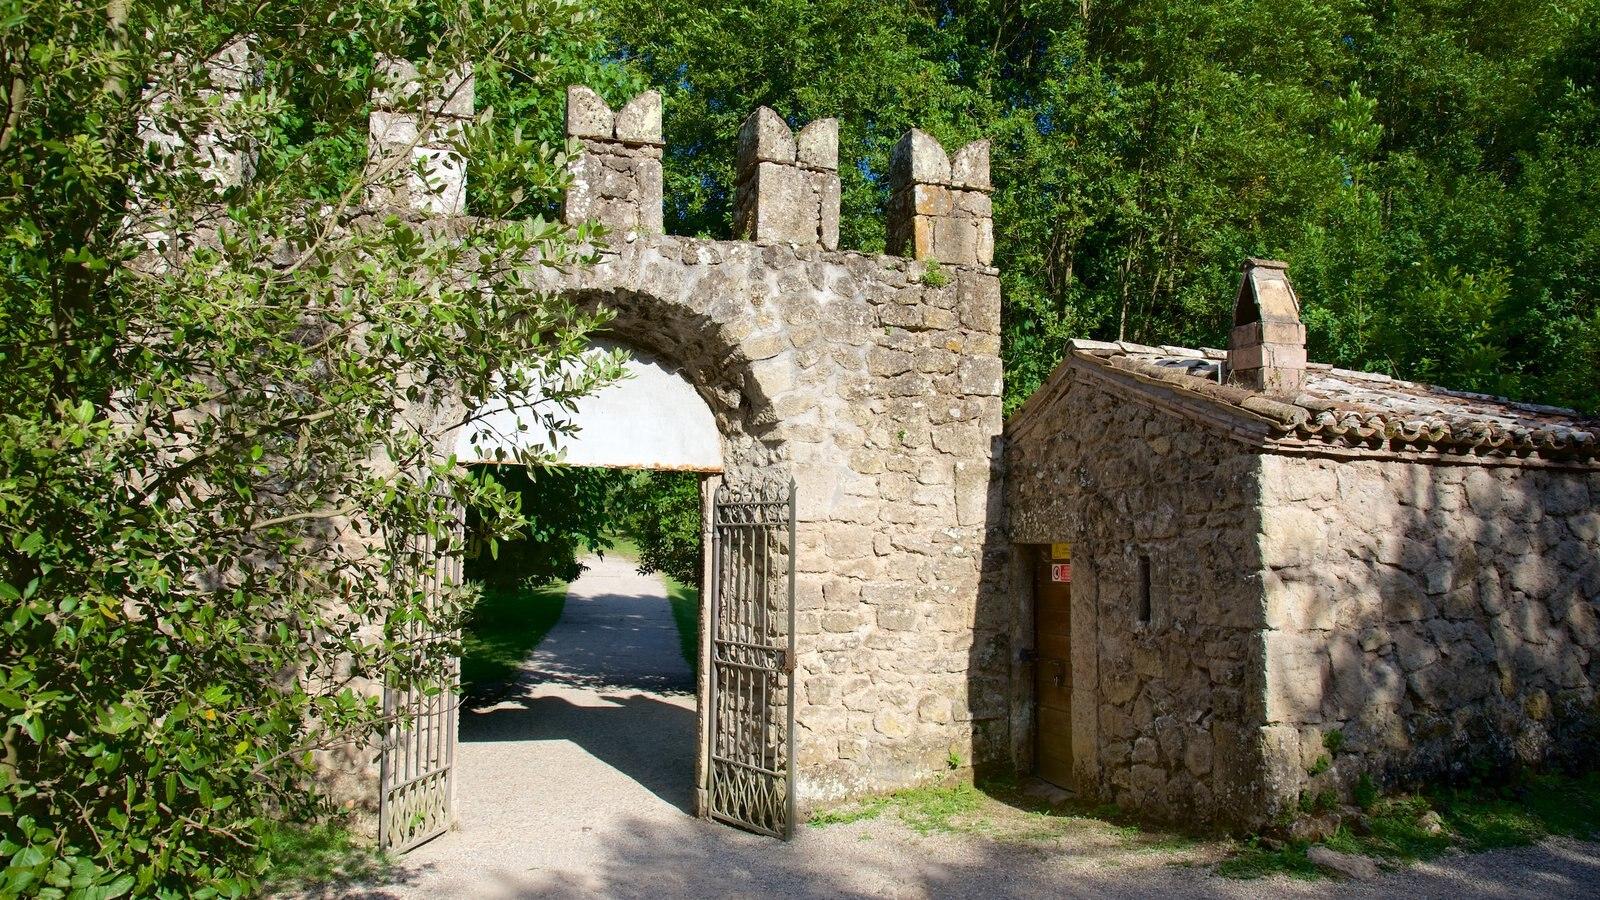 Parco dei Mostri featuring heritage architecture